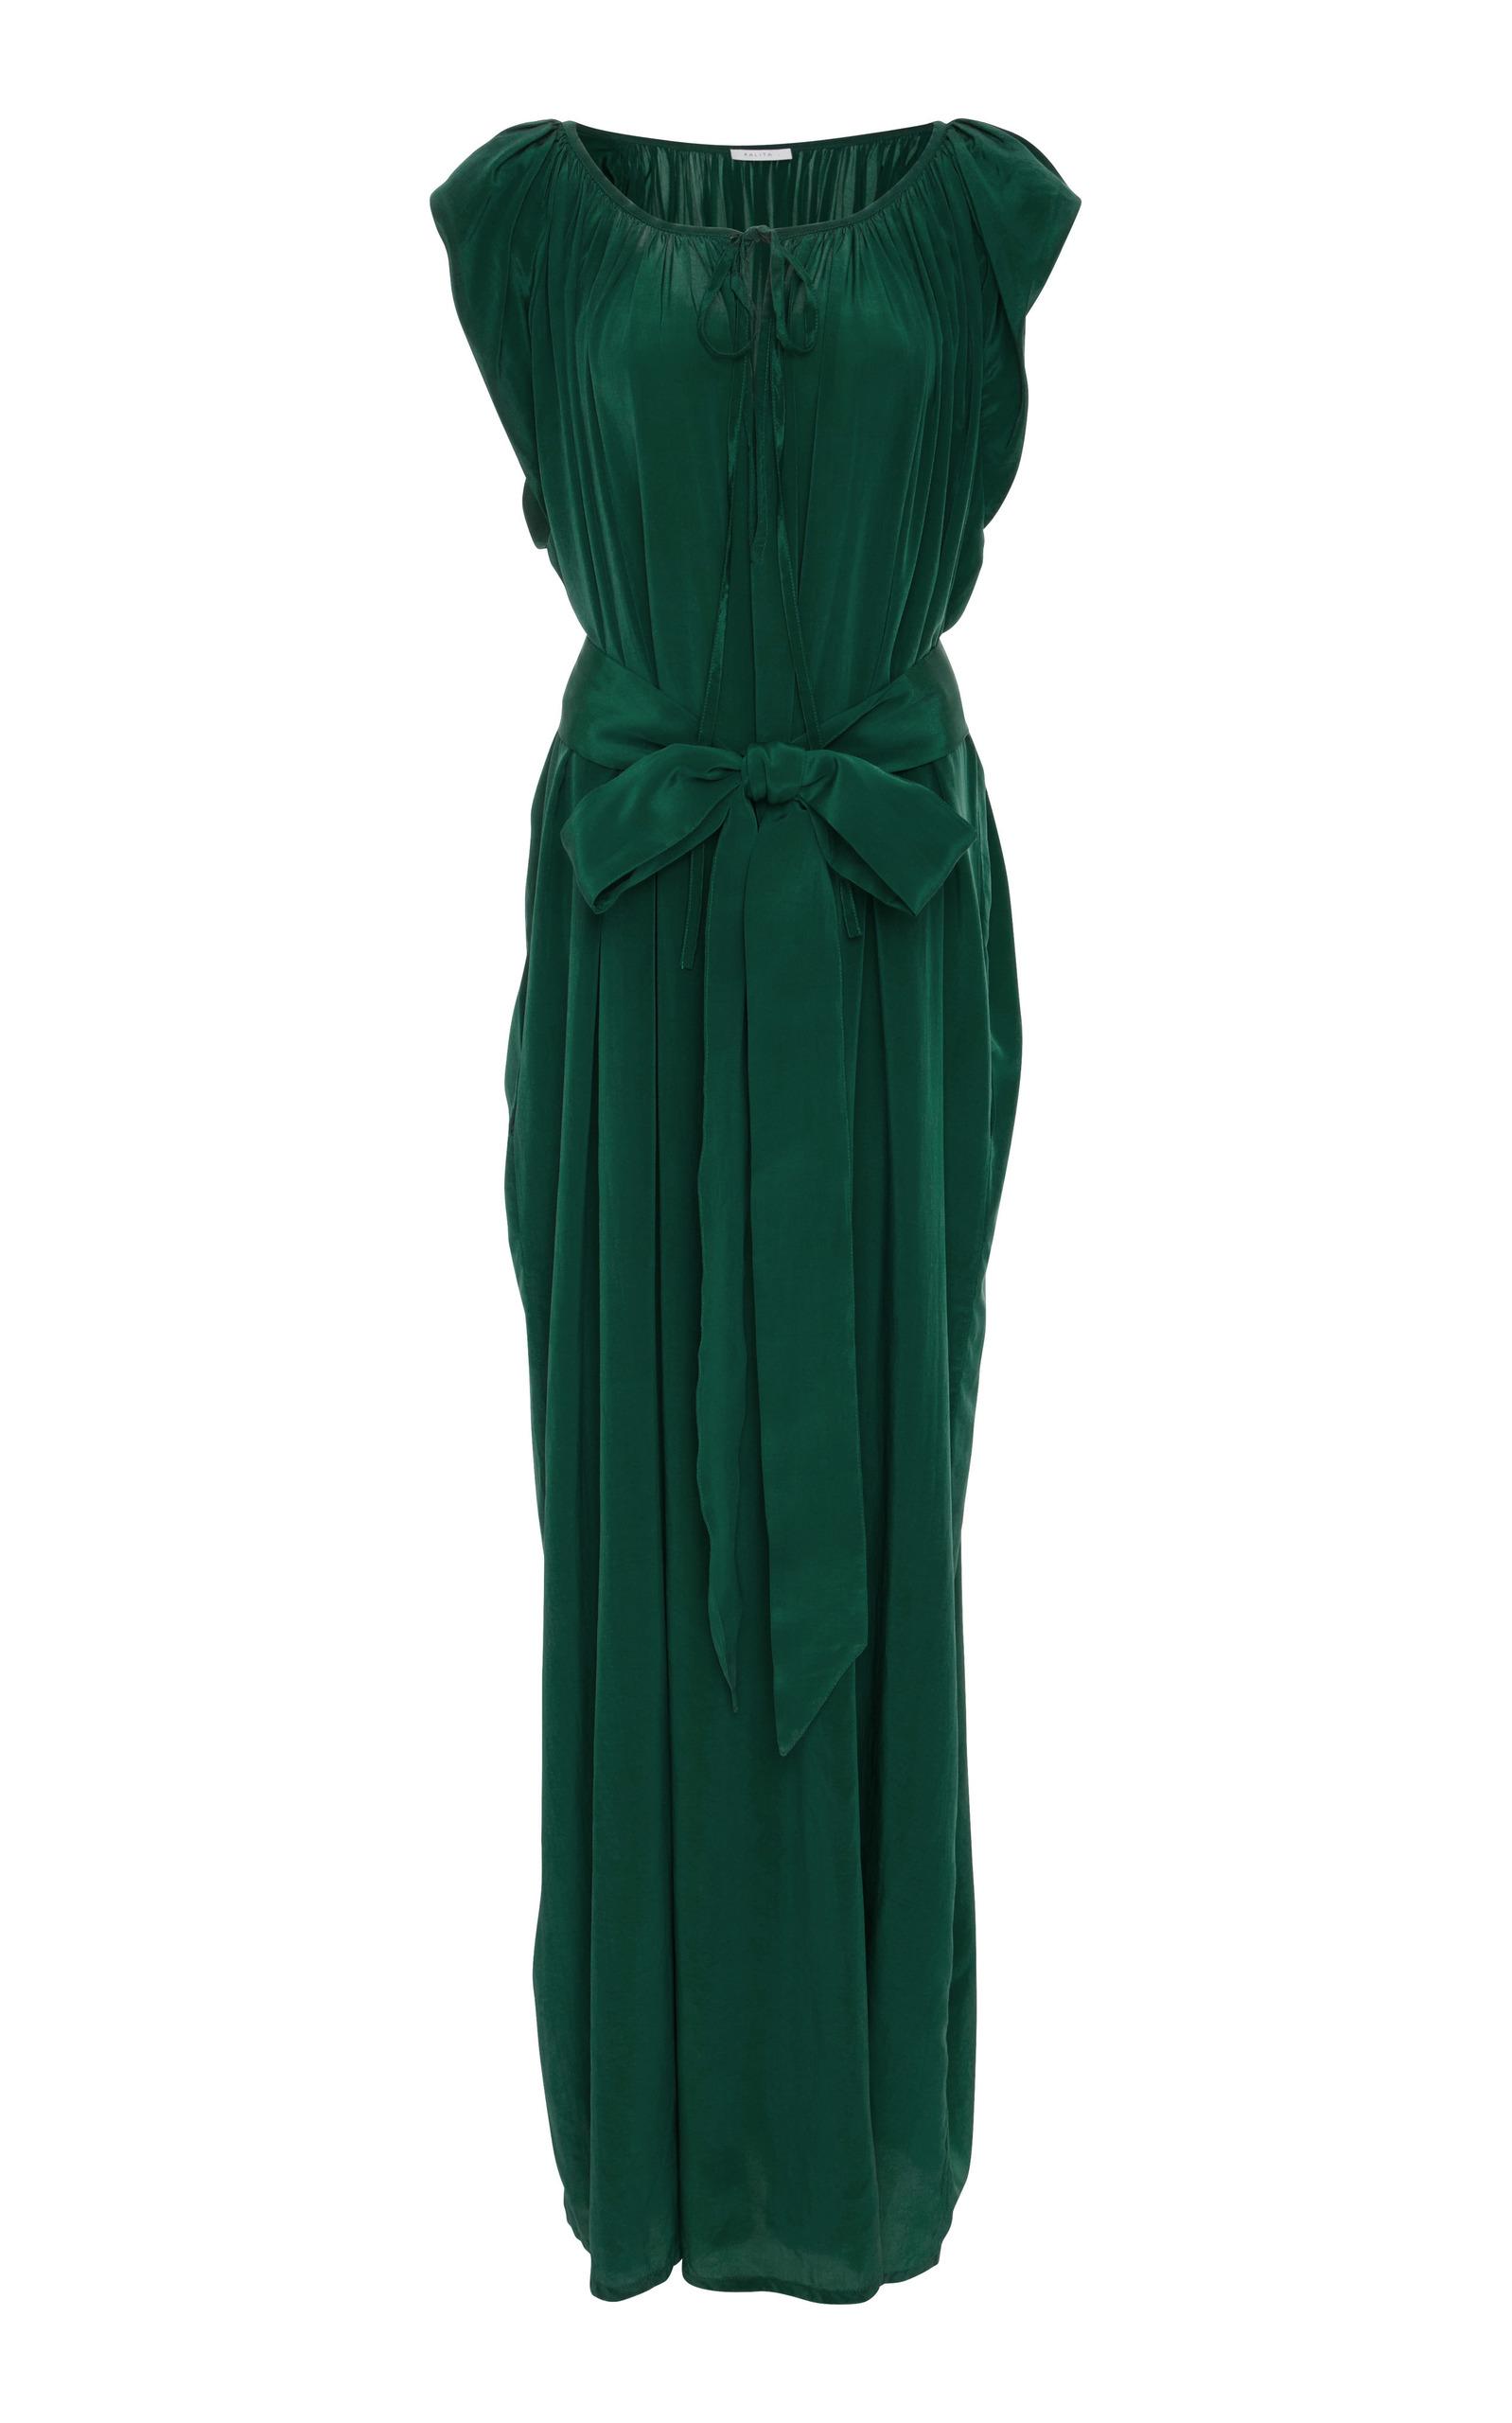 dfec0f1499 KalitaAndromeda Nights Maxi Dress. CLOSE. Loading